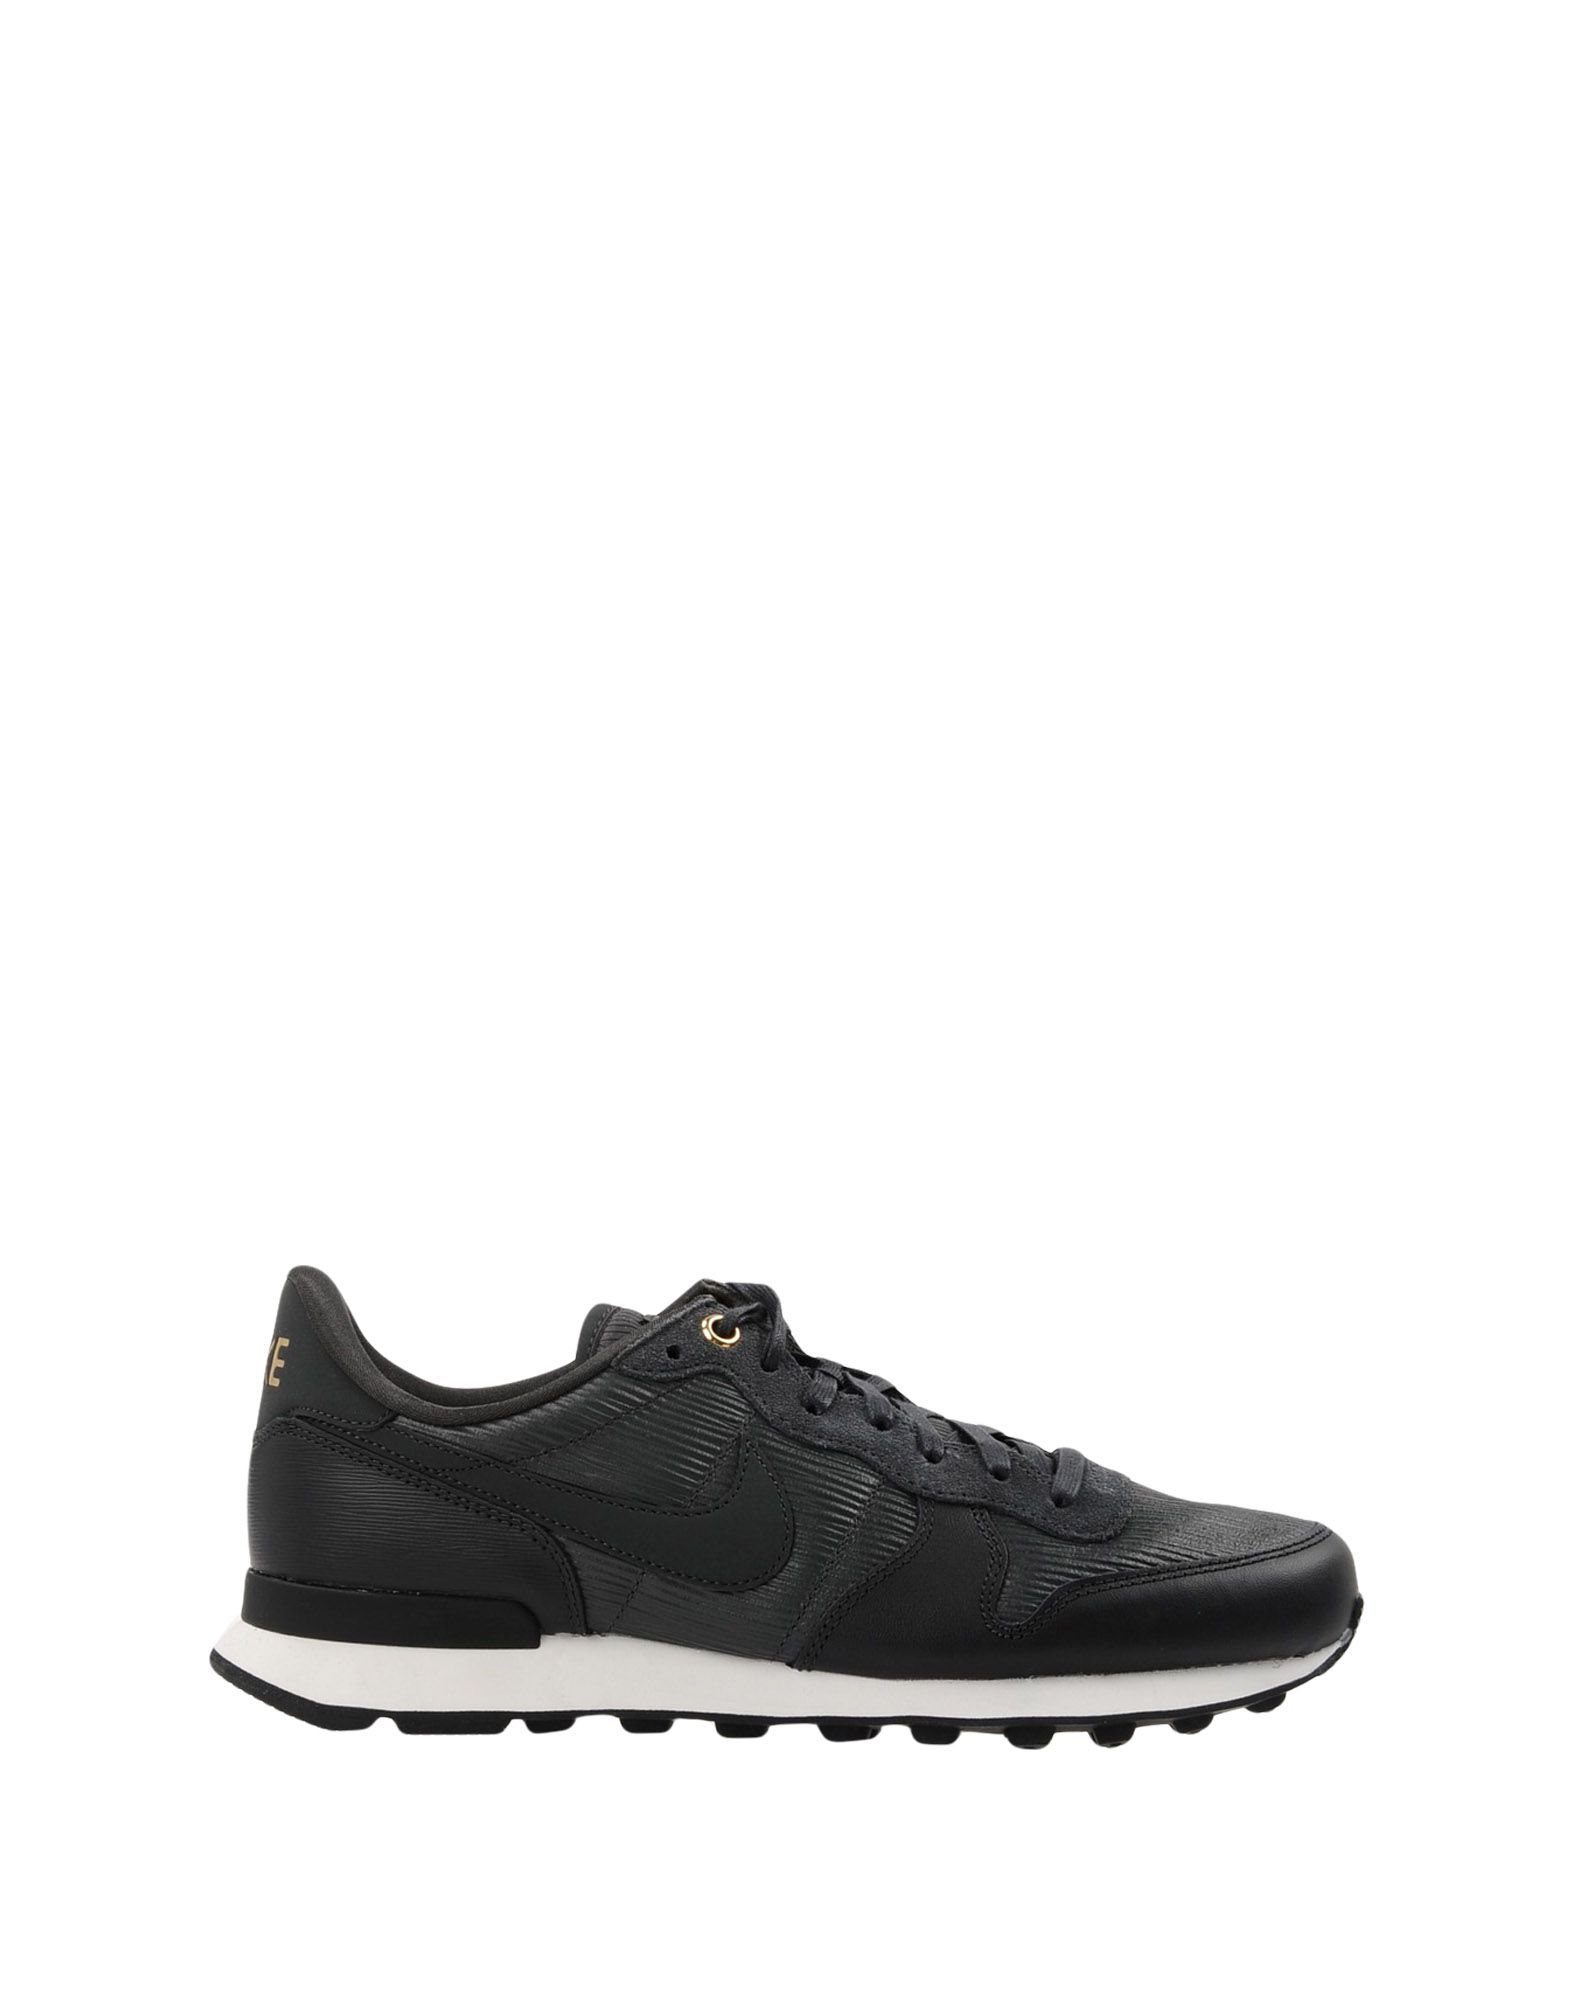 Nike Internationalist Premium Premium Internationalist  11431633OF  c232ba